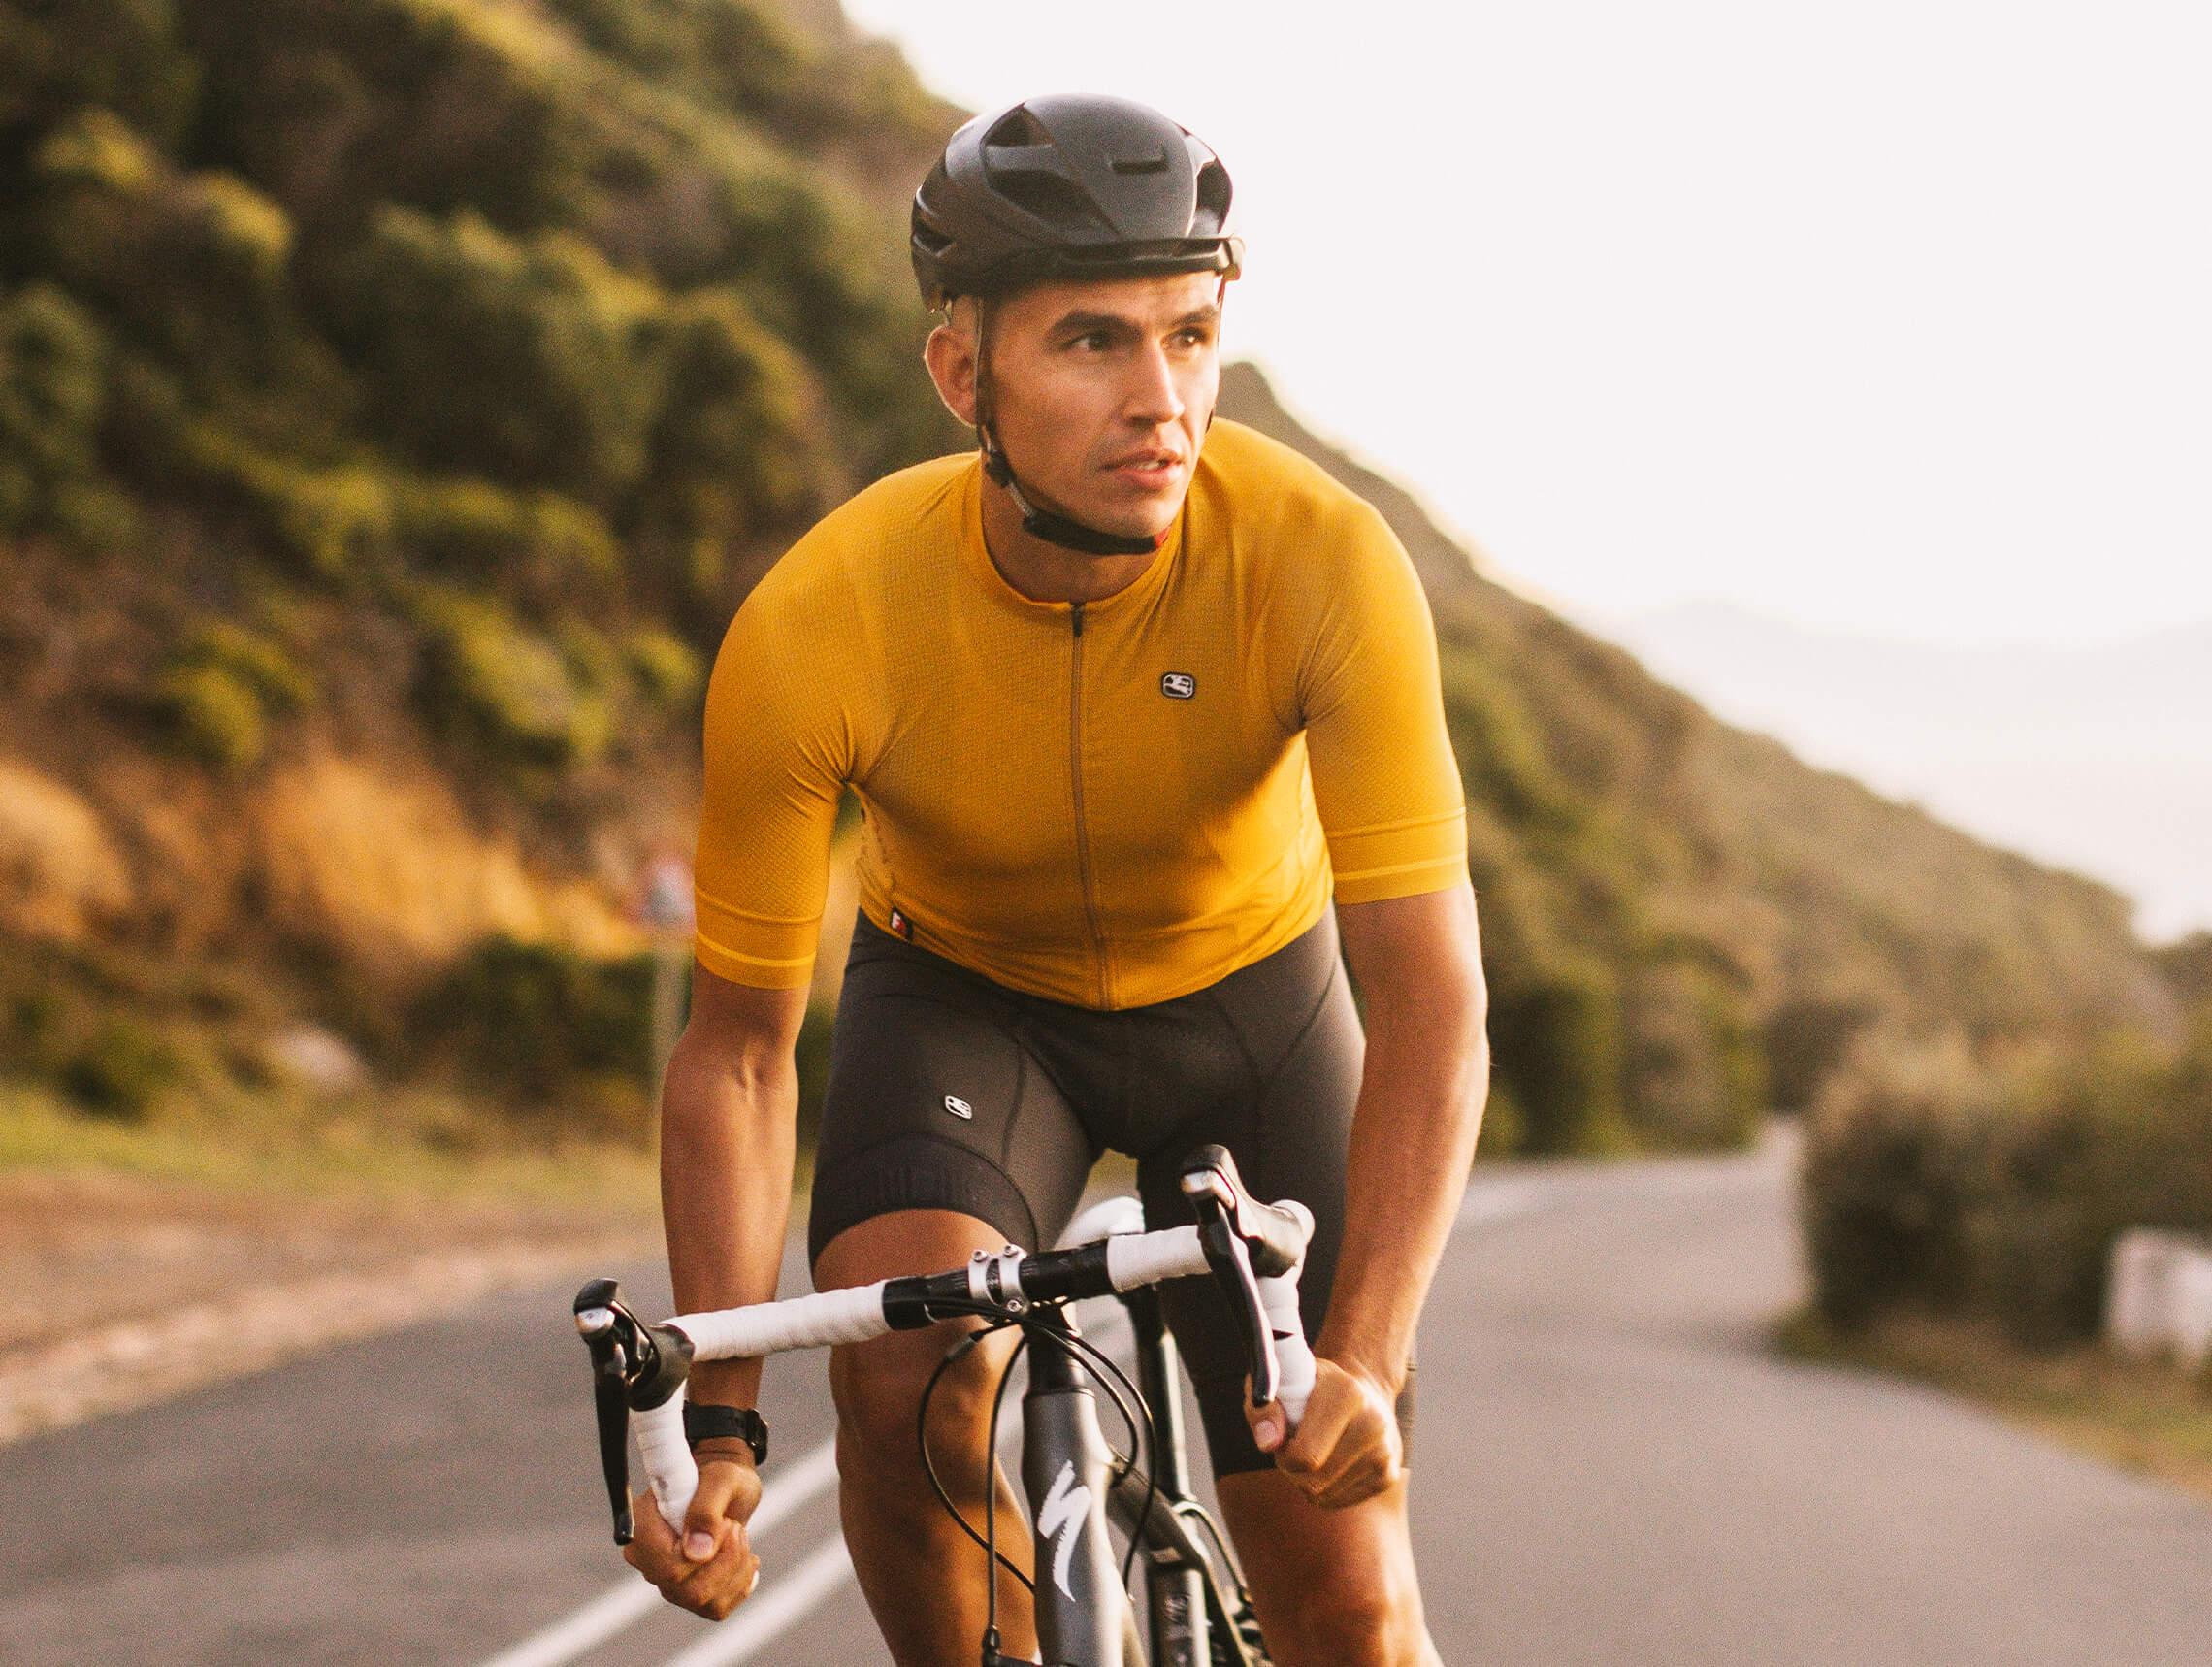 giordana-cycling-ss21-jersey-guide-men-fr-c-1-new-1